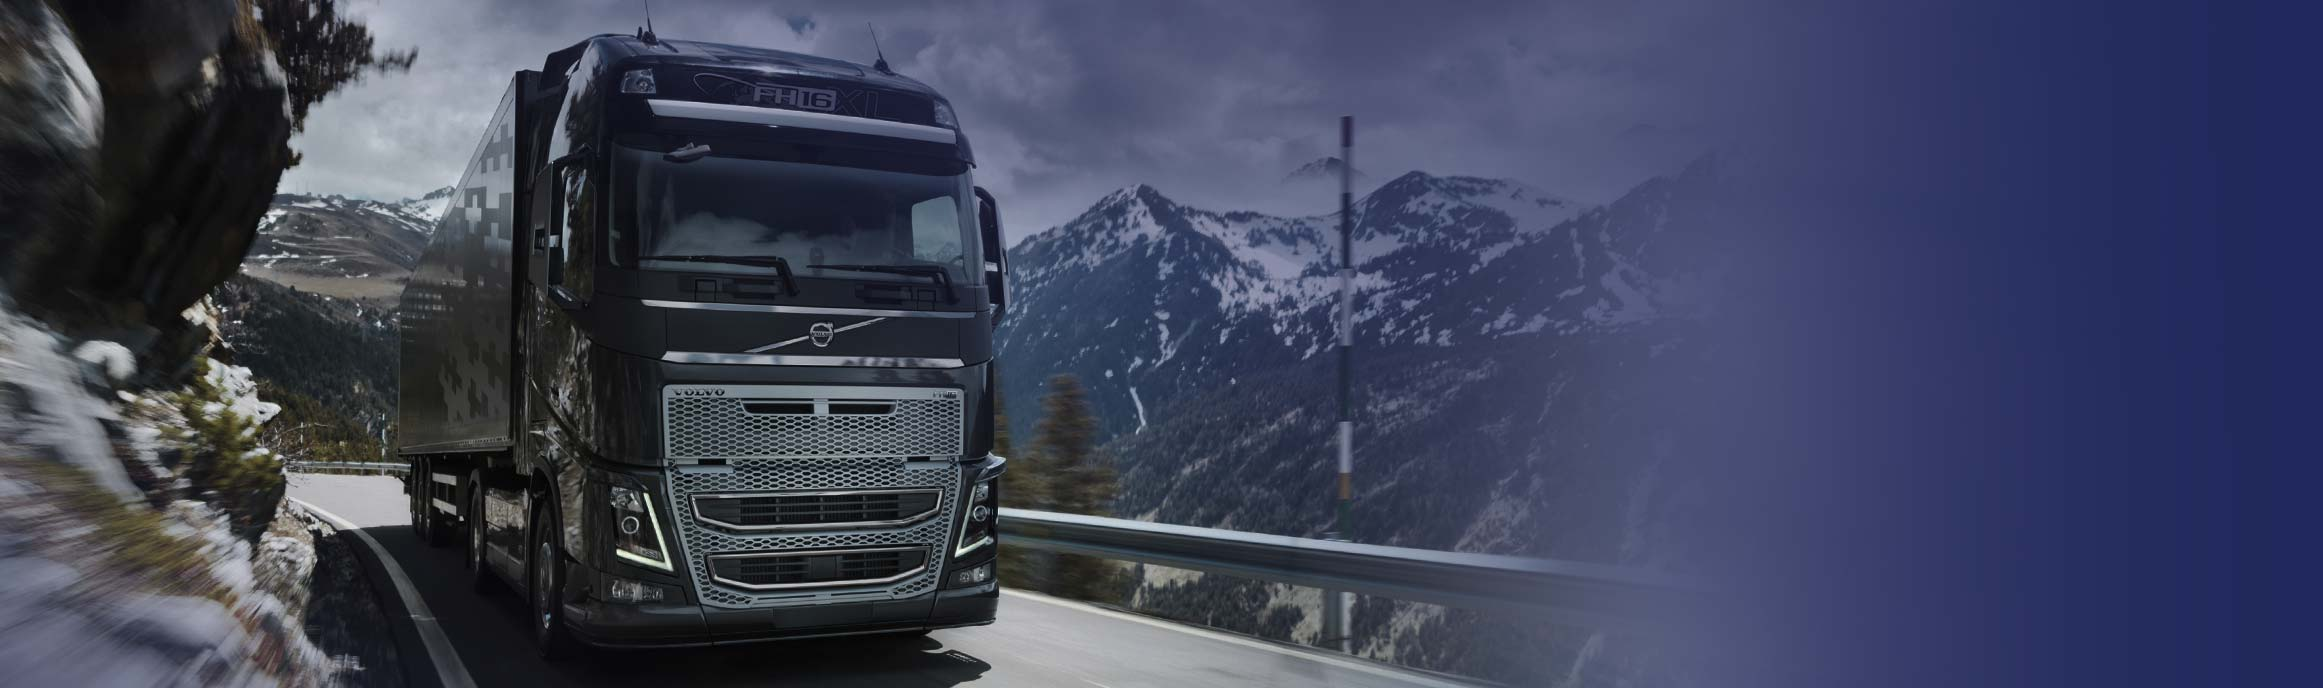 Volvo FH 16 Trucks bij BAS Truck Center